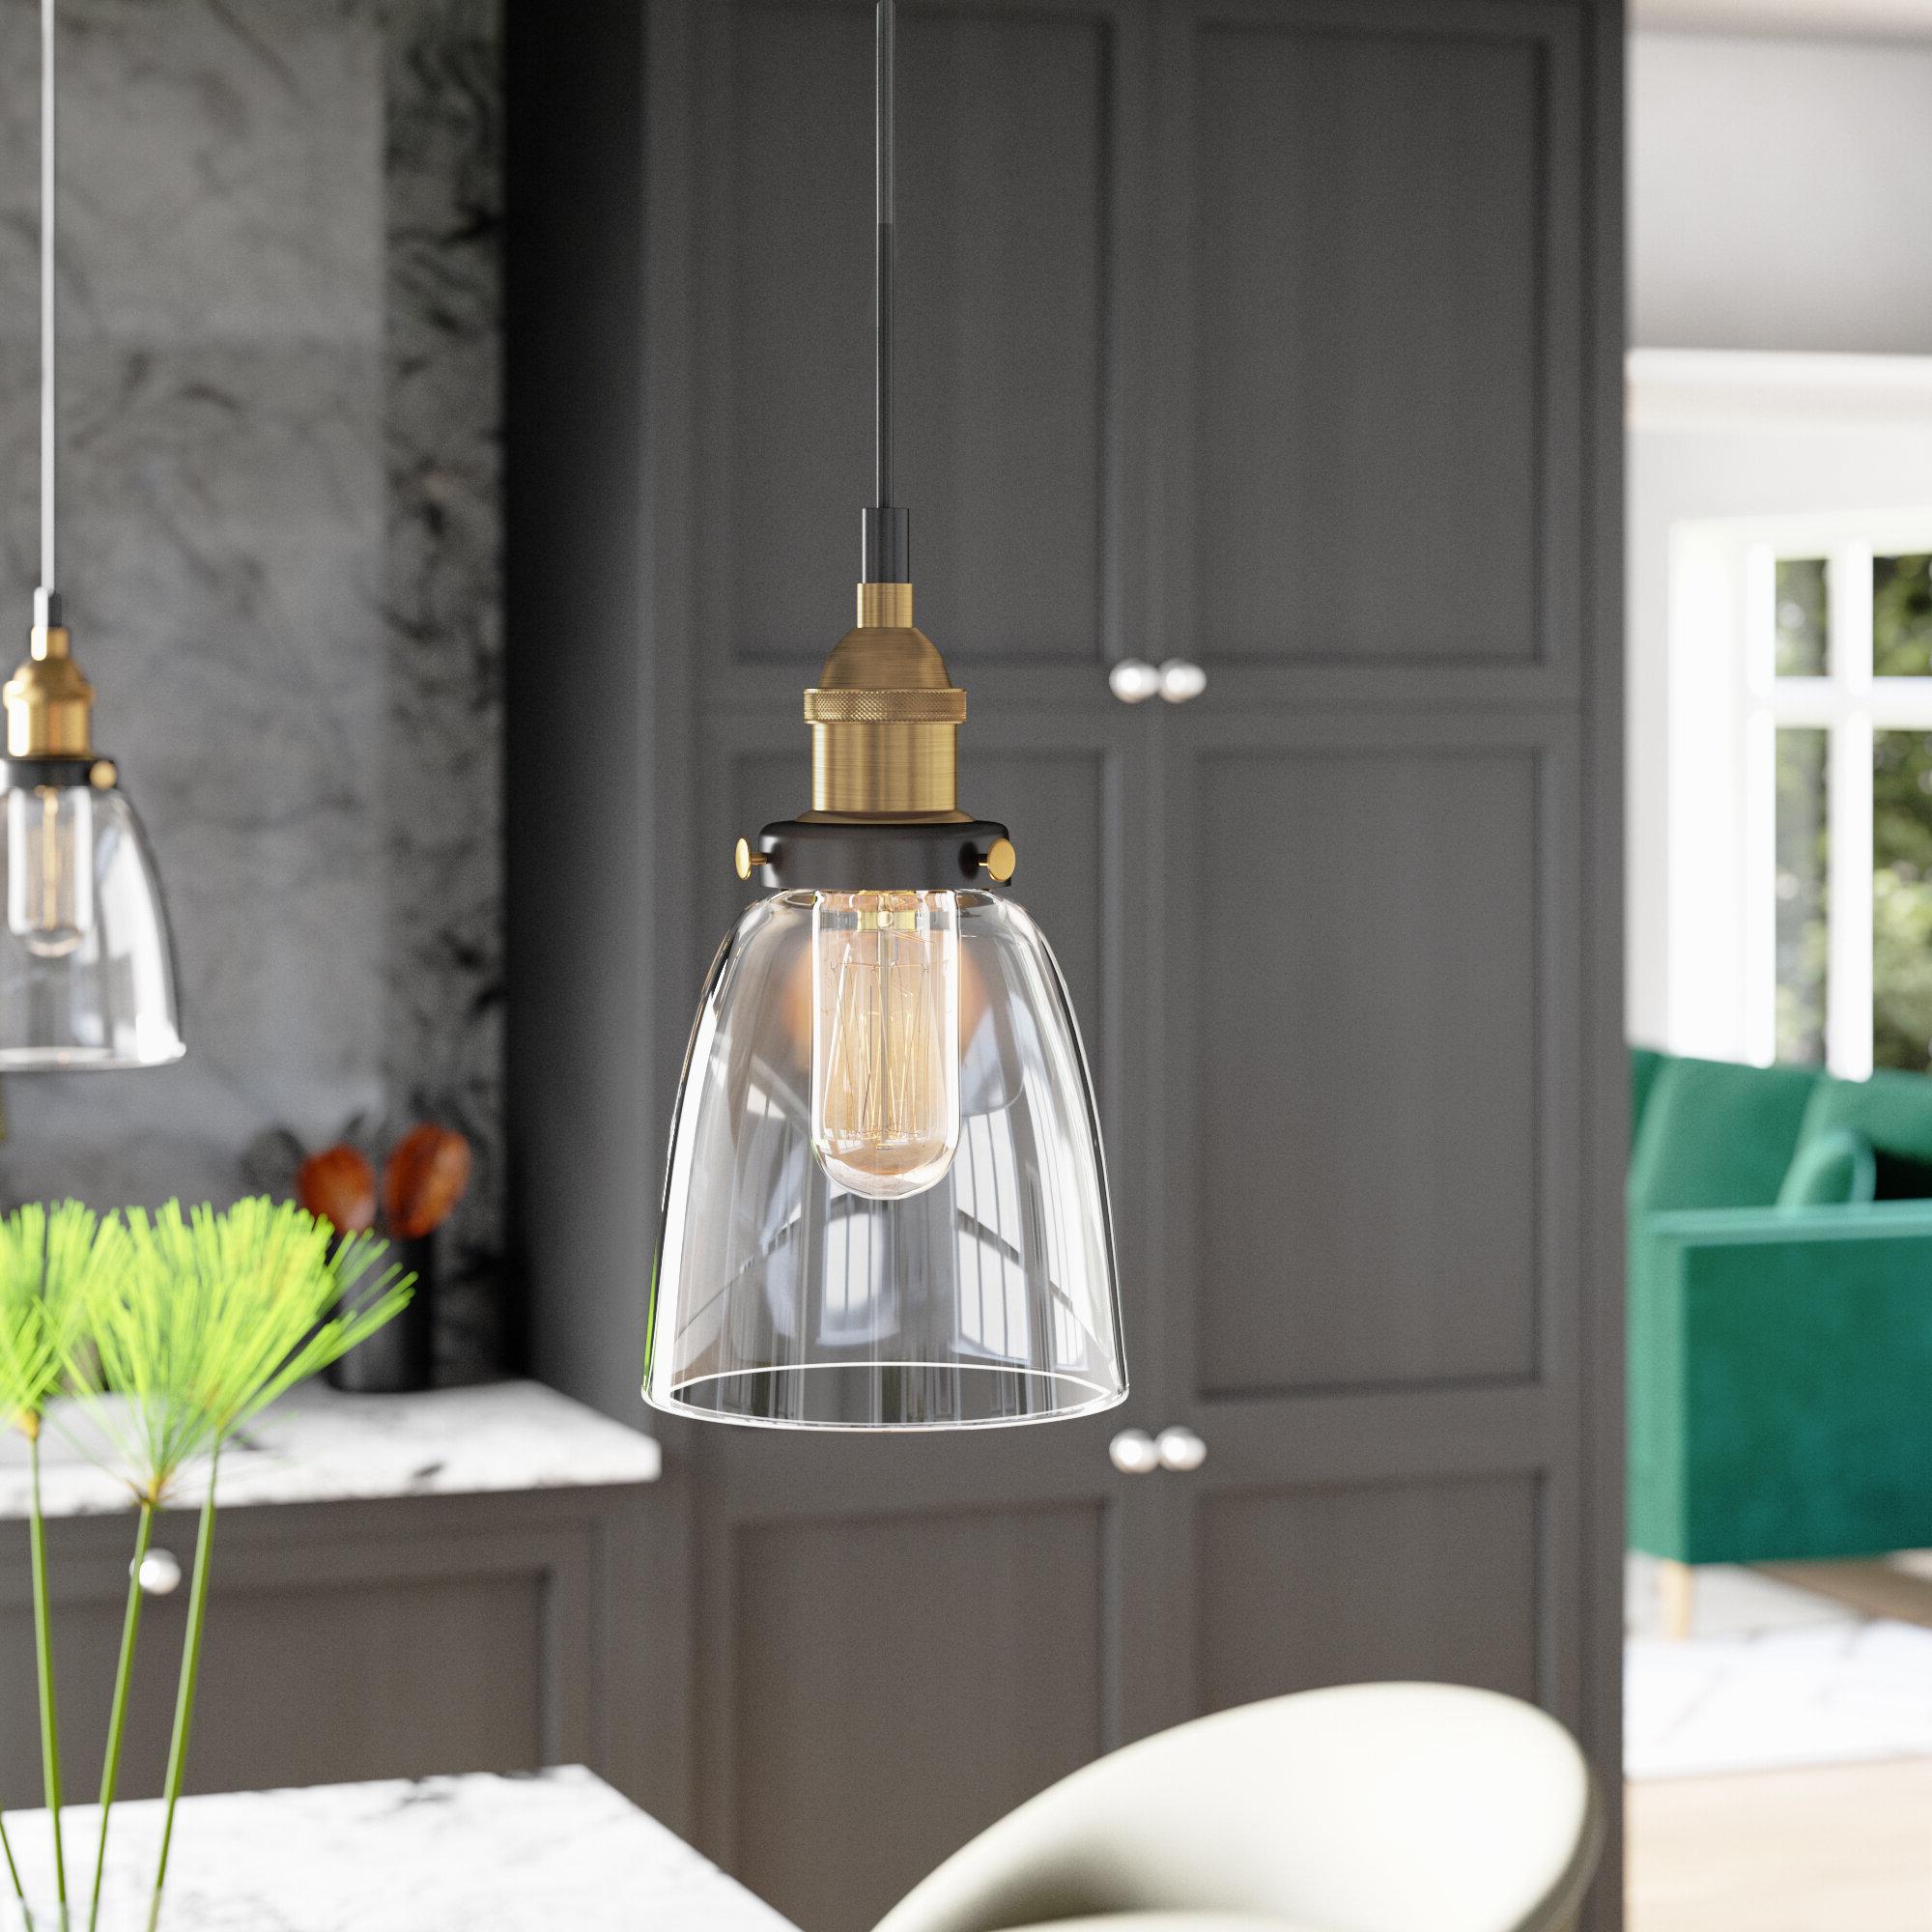 2020 Mercury Row Bundaberg 1 Light Single Bell Pendant & Reviews Throughout Sue 1 Light Single Jar Pendants (View 22 of 25)